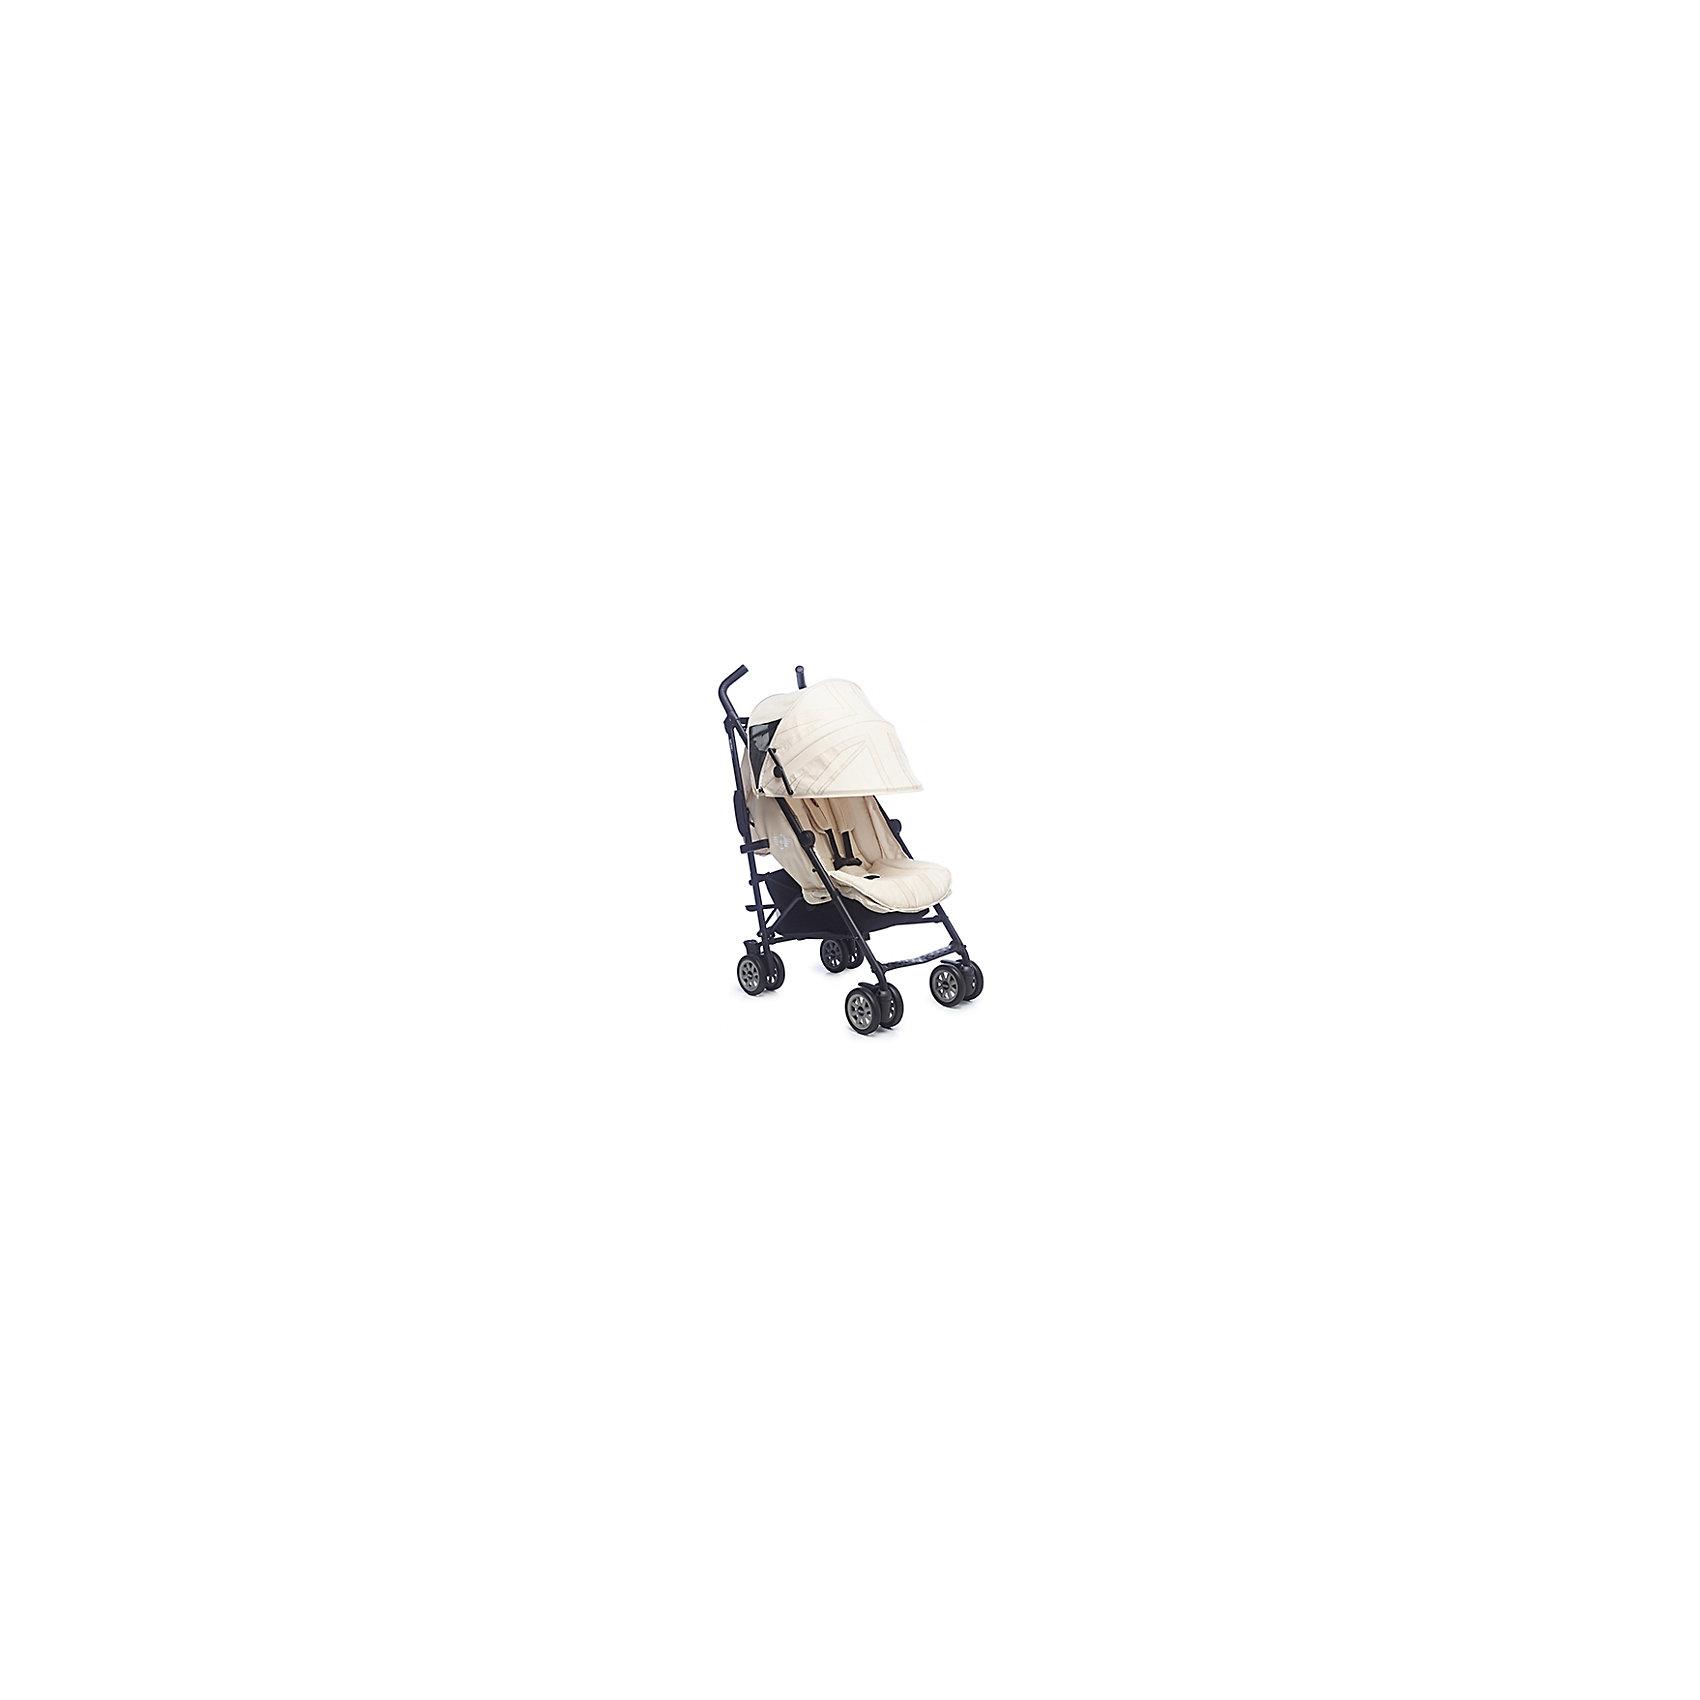 Коляска-трость Easywalker MINI XL Milky Jack,Коляски-трости<br>EMB20023 Коляска MINI by Easywalker buggy XL Milky Jack + EB10103 Бампер Easywalker buggy bumper bar Black<br><br>Ширина мм: 1020<br>Глубина мм: 230<br>Высота мм: 280<br>Вес г: 9740<br>Возраст от месяцев: 0<br>Возраст до месяцев: 48<br>Пол: Унисекс<br>Возраст: Детский<br>SKU: 5613103